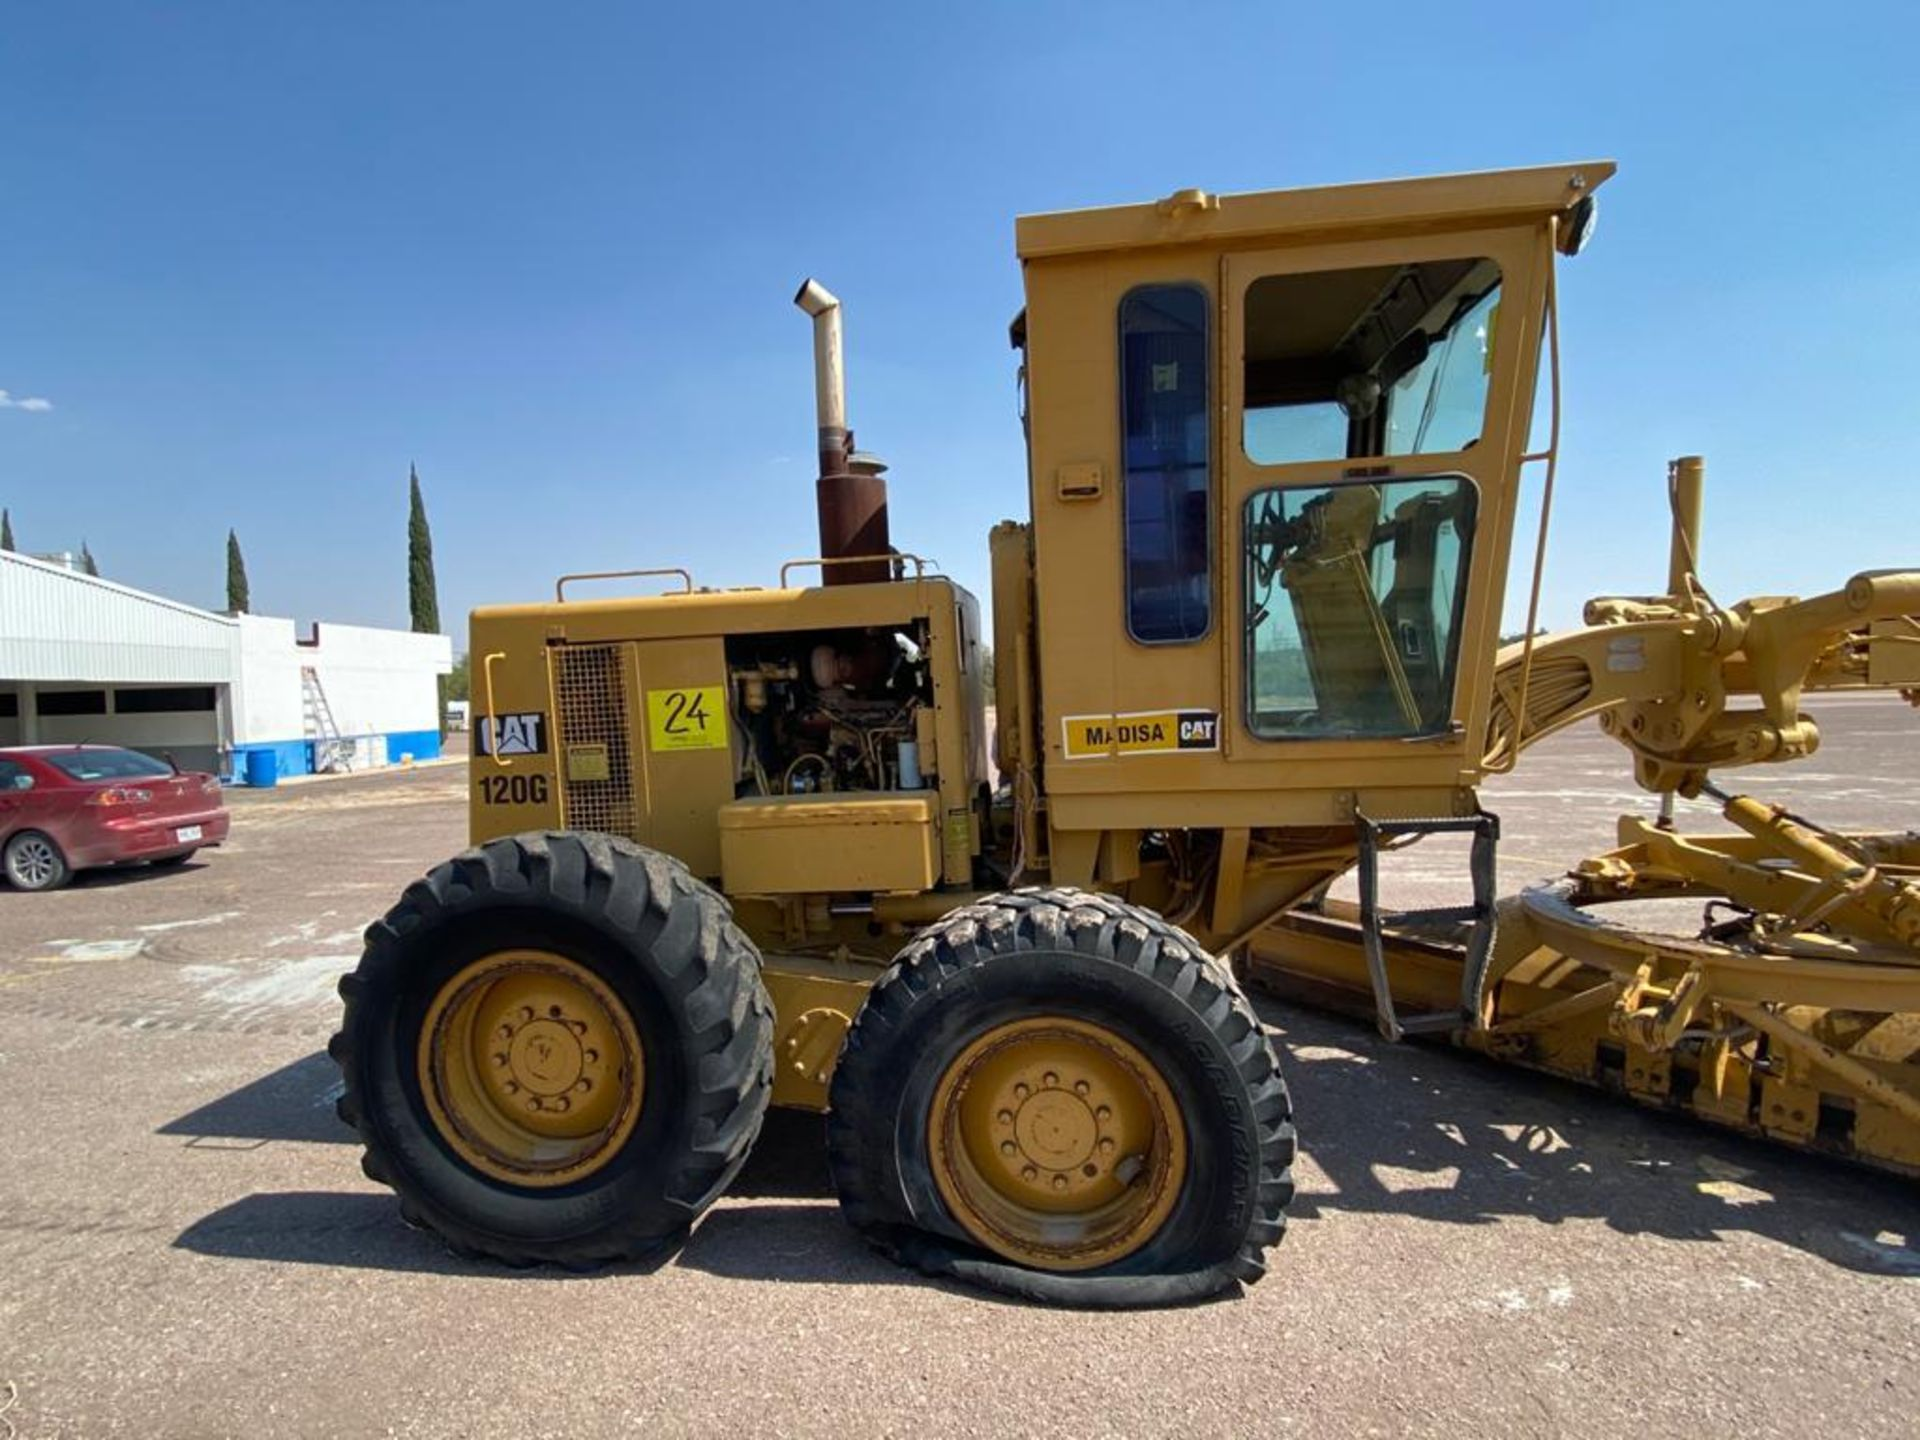 Caterpillar 120G Motor Grader, Serial number 87V09646, Motor number PQ883-2/07Z28983 - Image 19 of 61